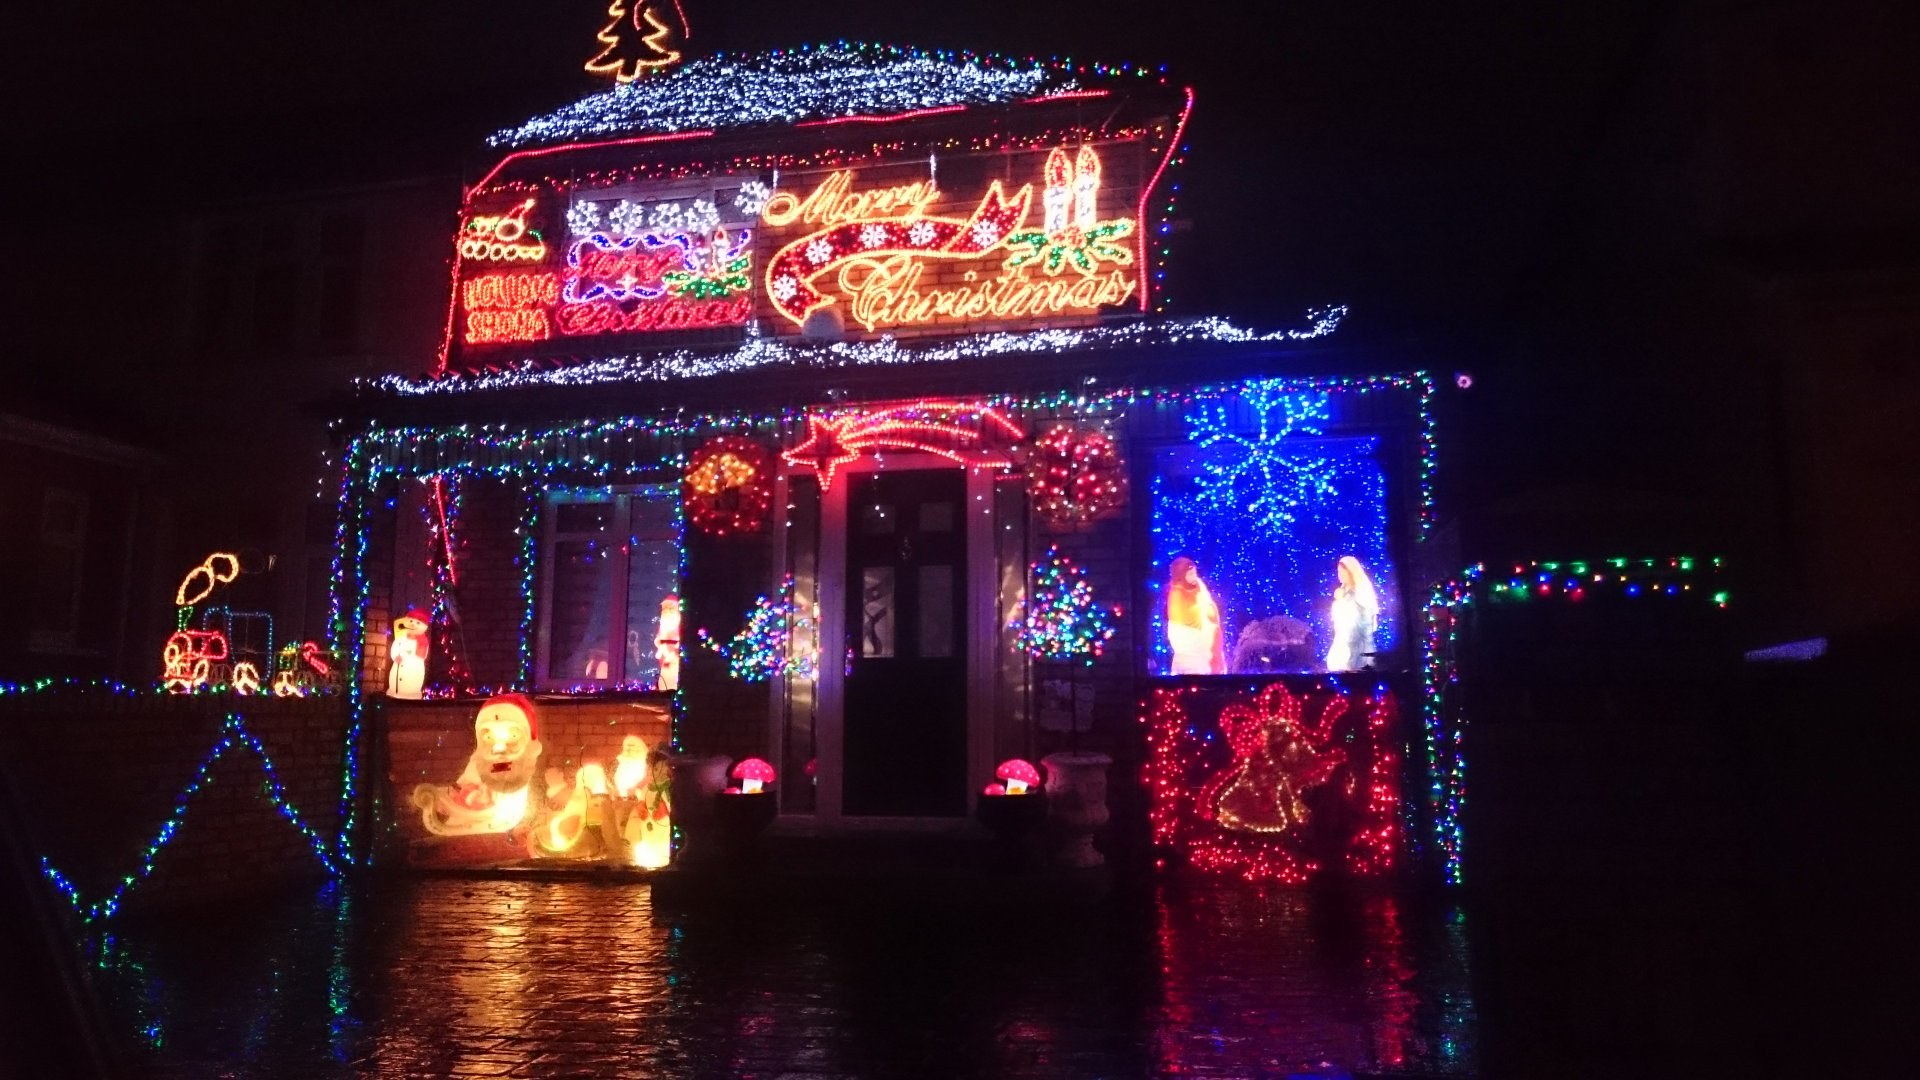 cabra house